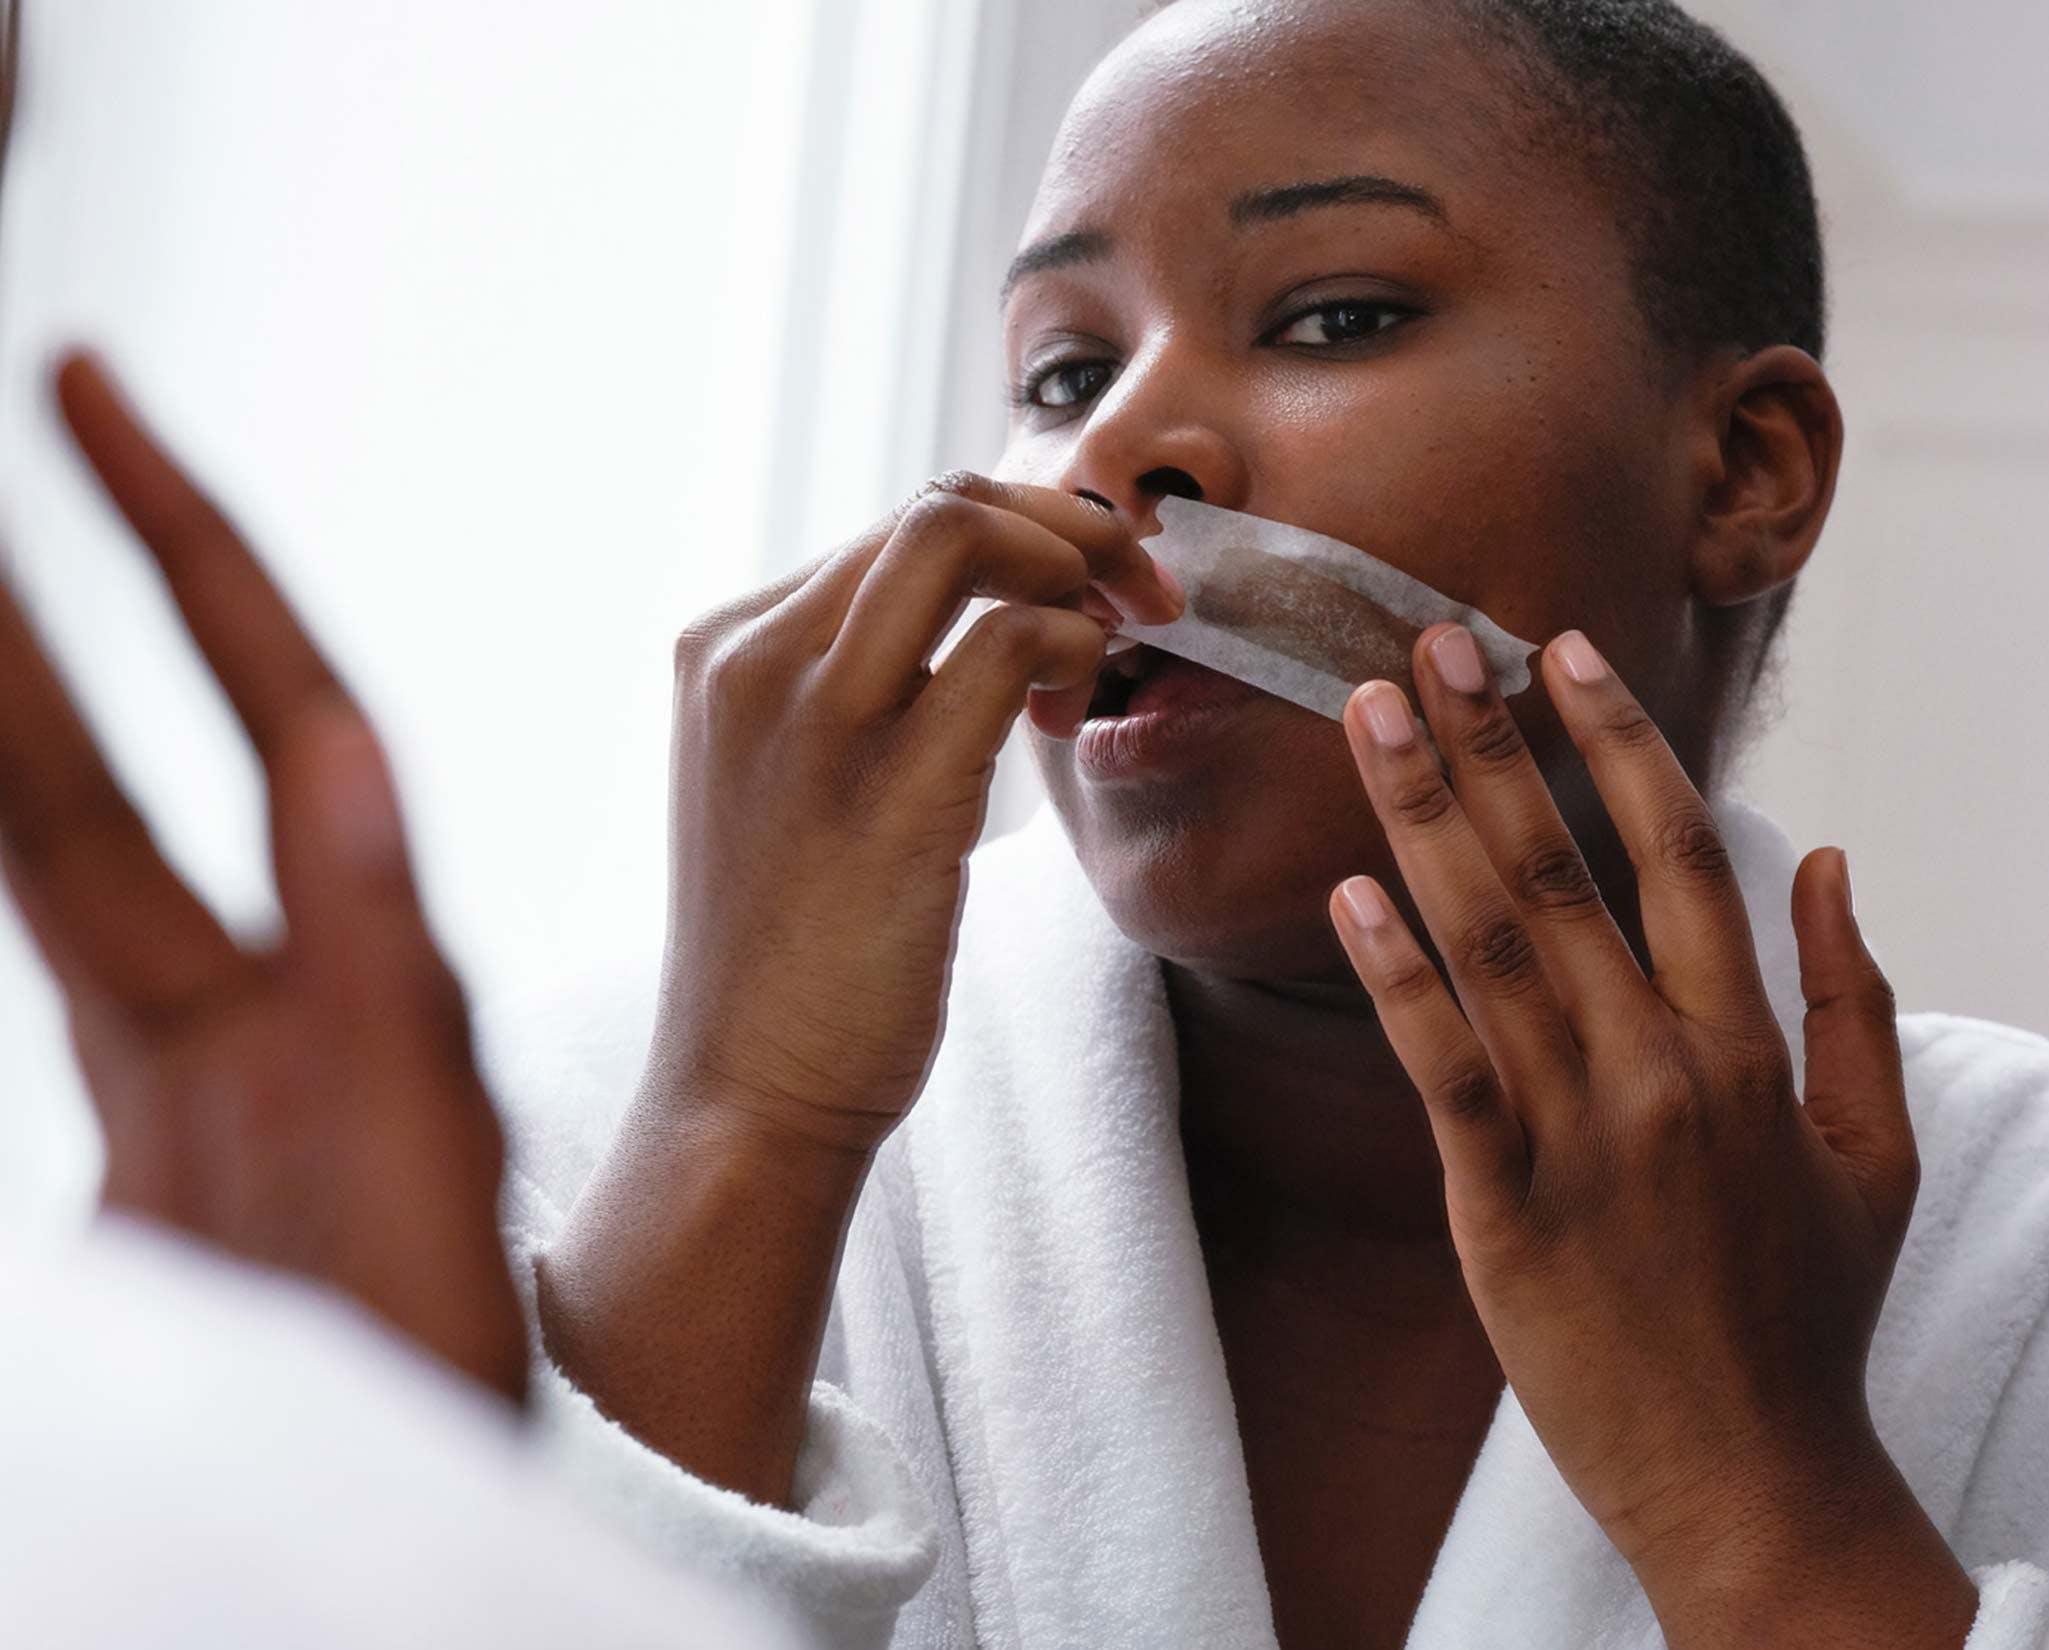 Woman pressing Flamingo Face Wax Strip into upper lip hair